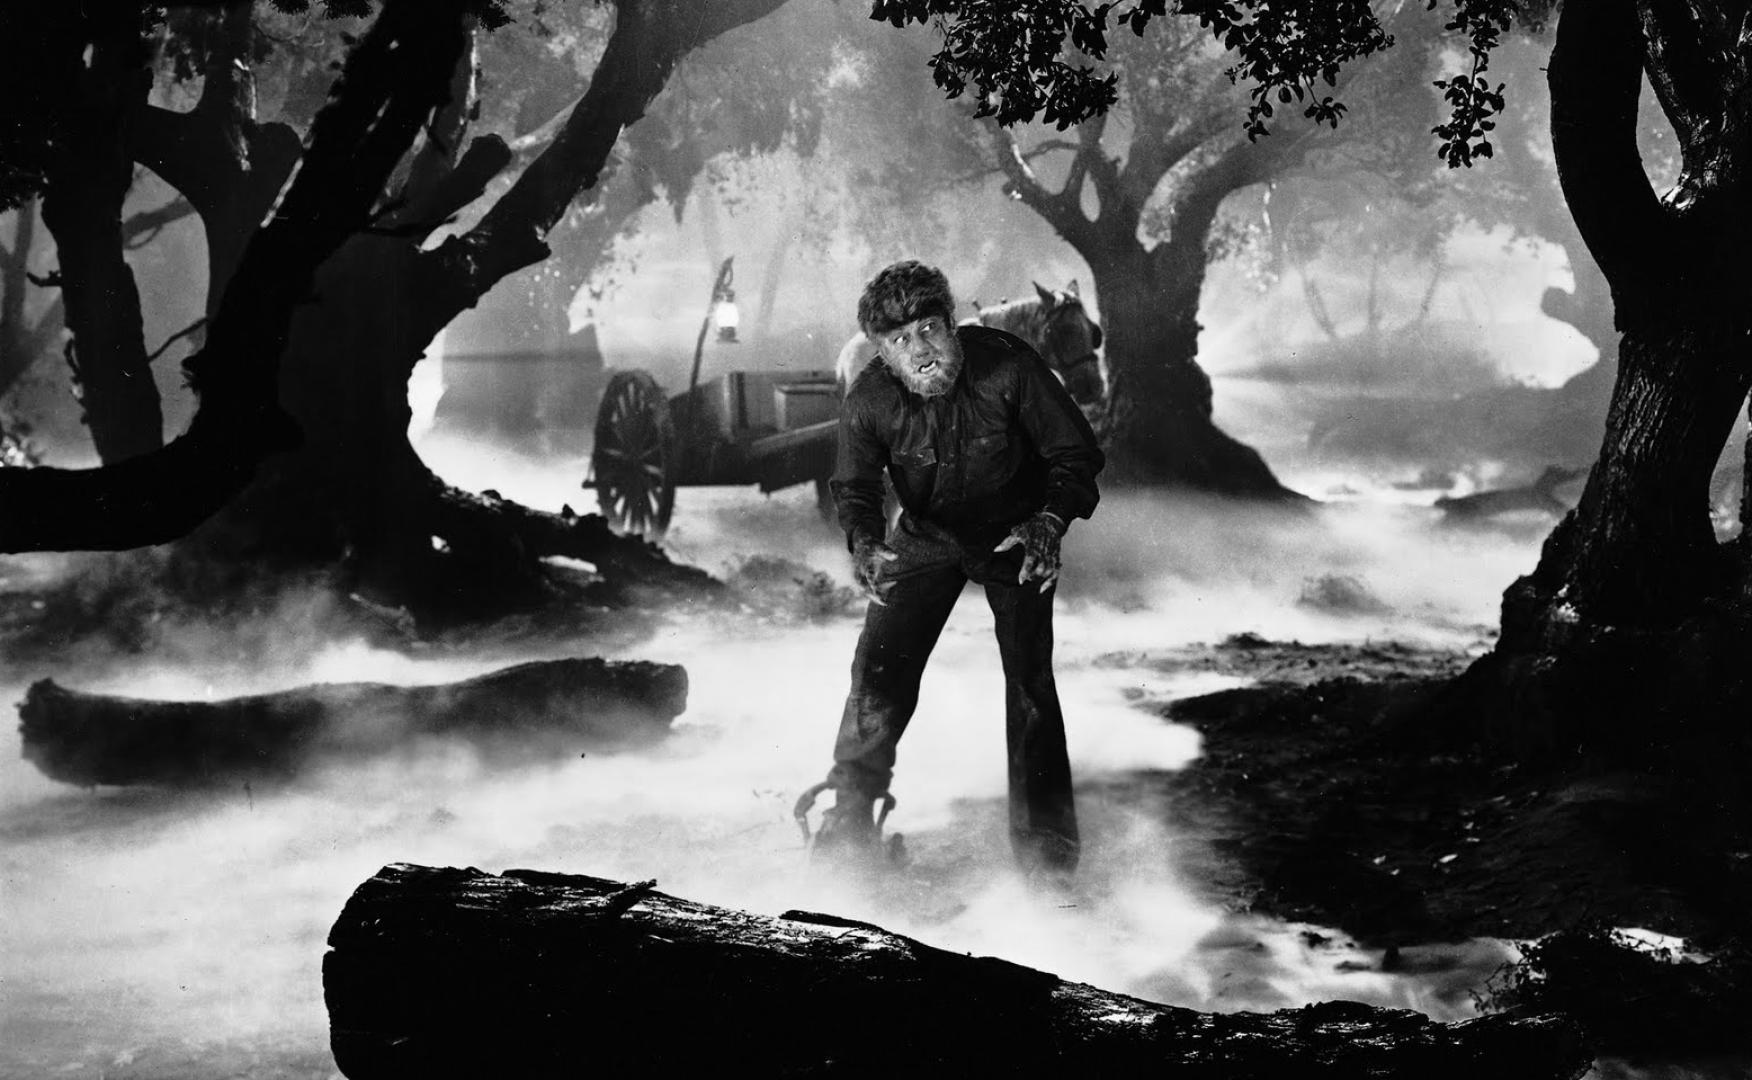 The Wolf Man - A farkasember (1941) 1. kép